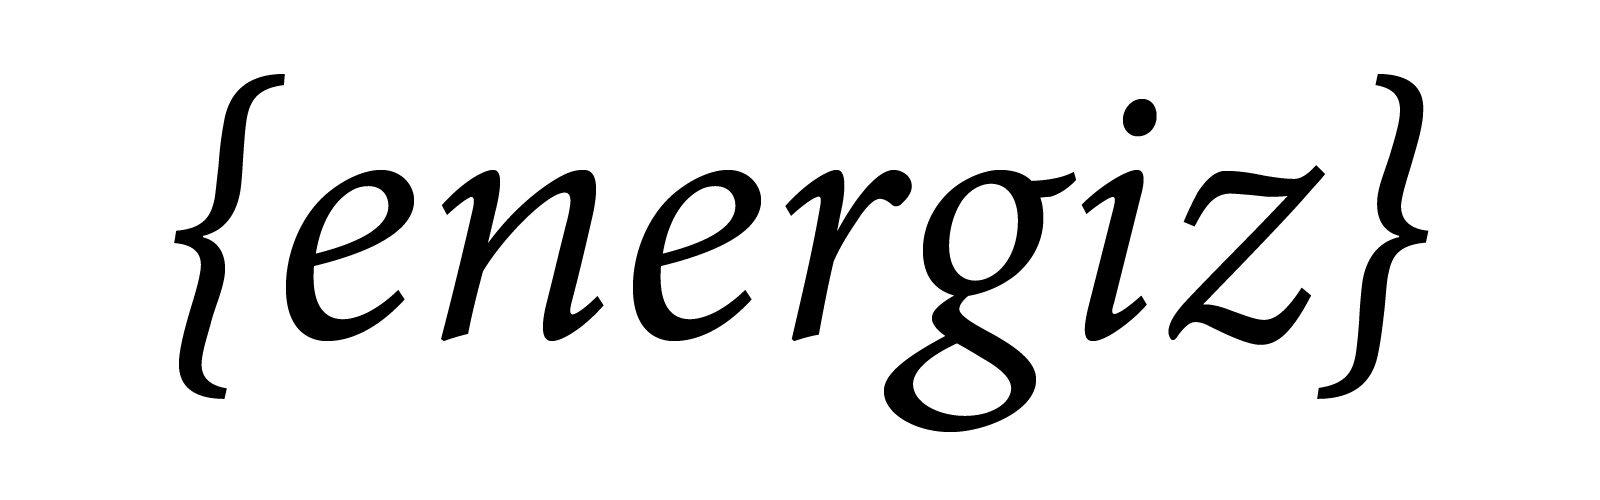 energiz logo